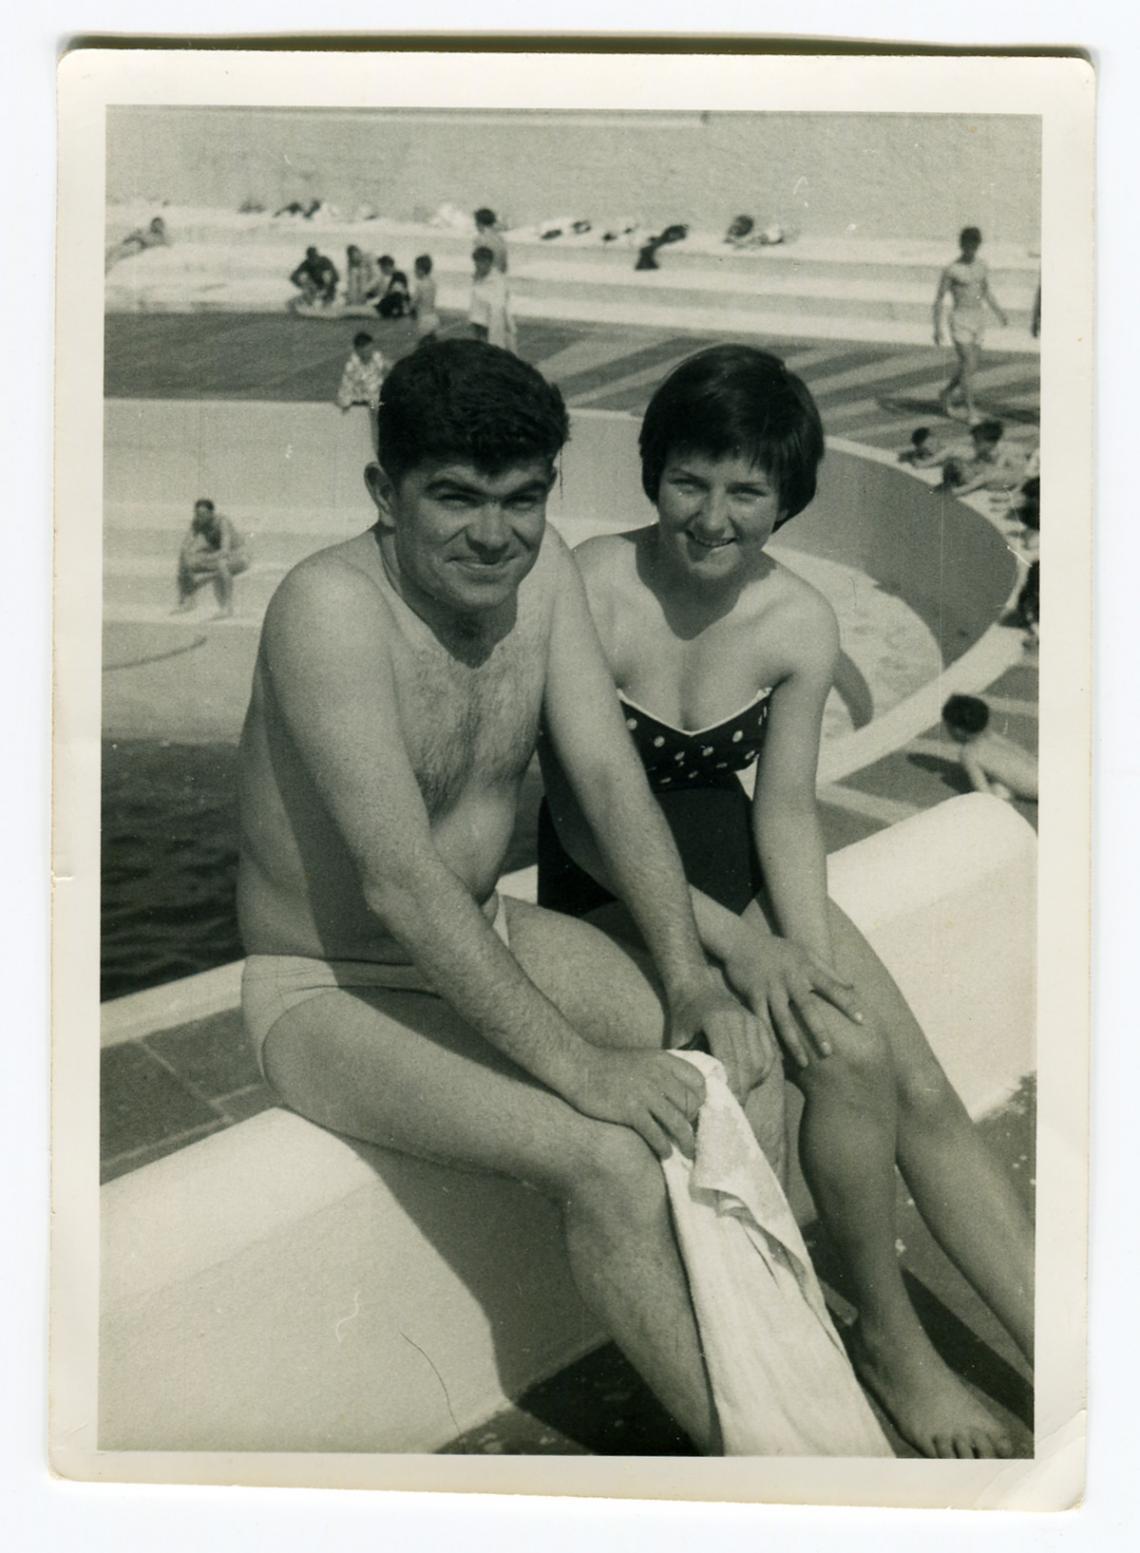 Brian Martin at Jubilee Pool